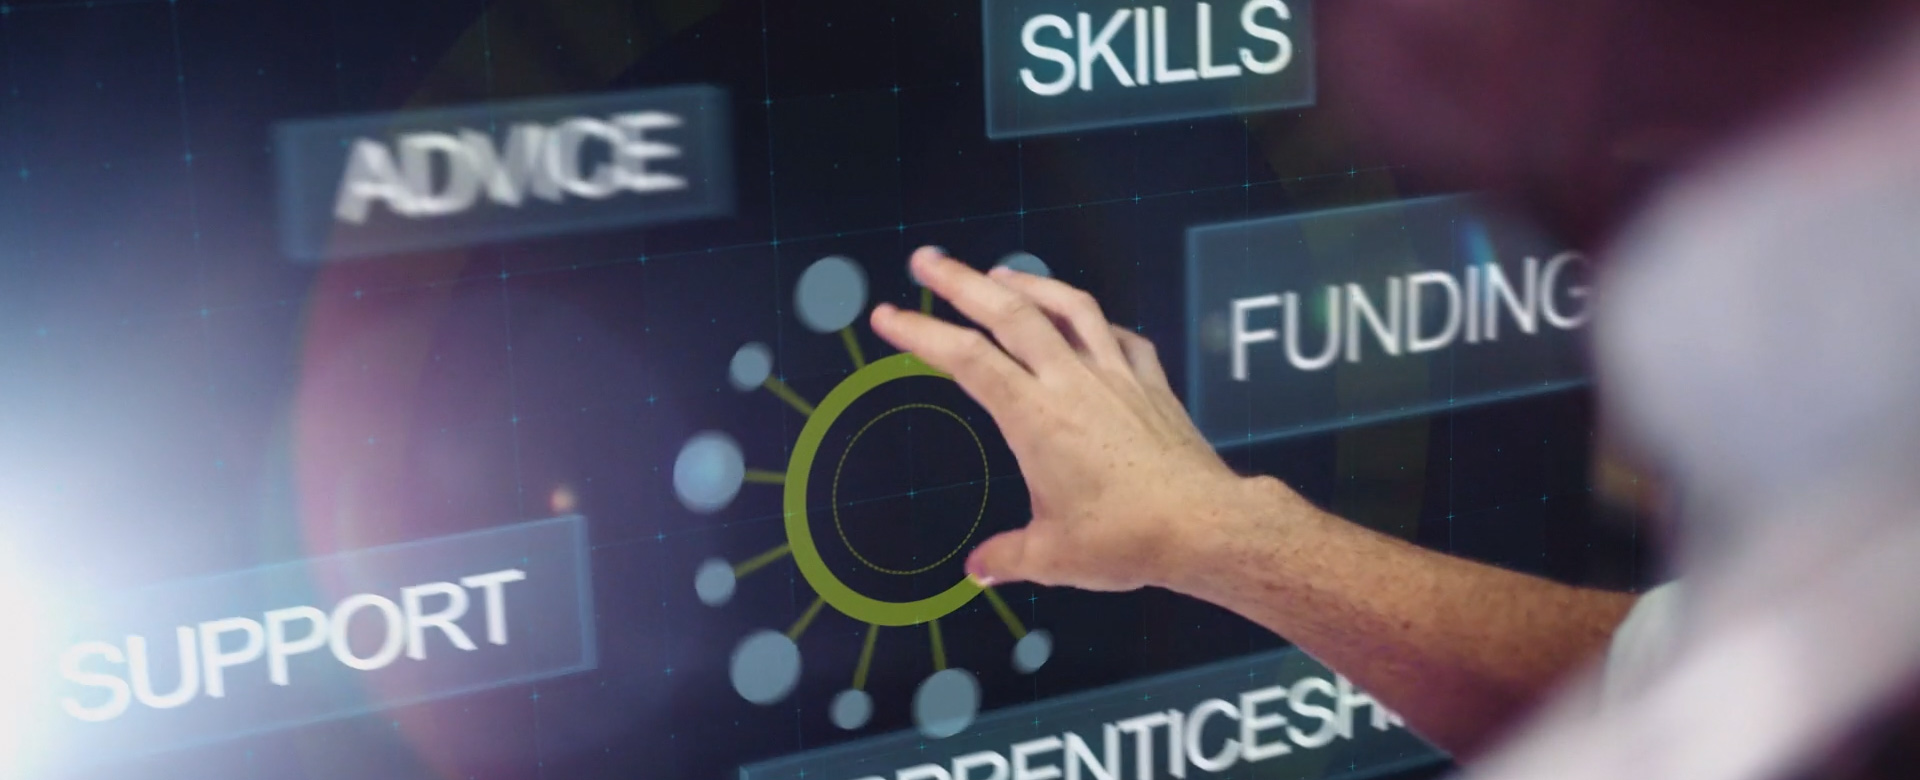 Profiting through Skills